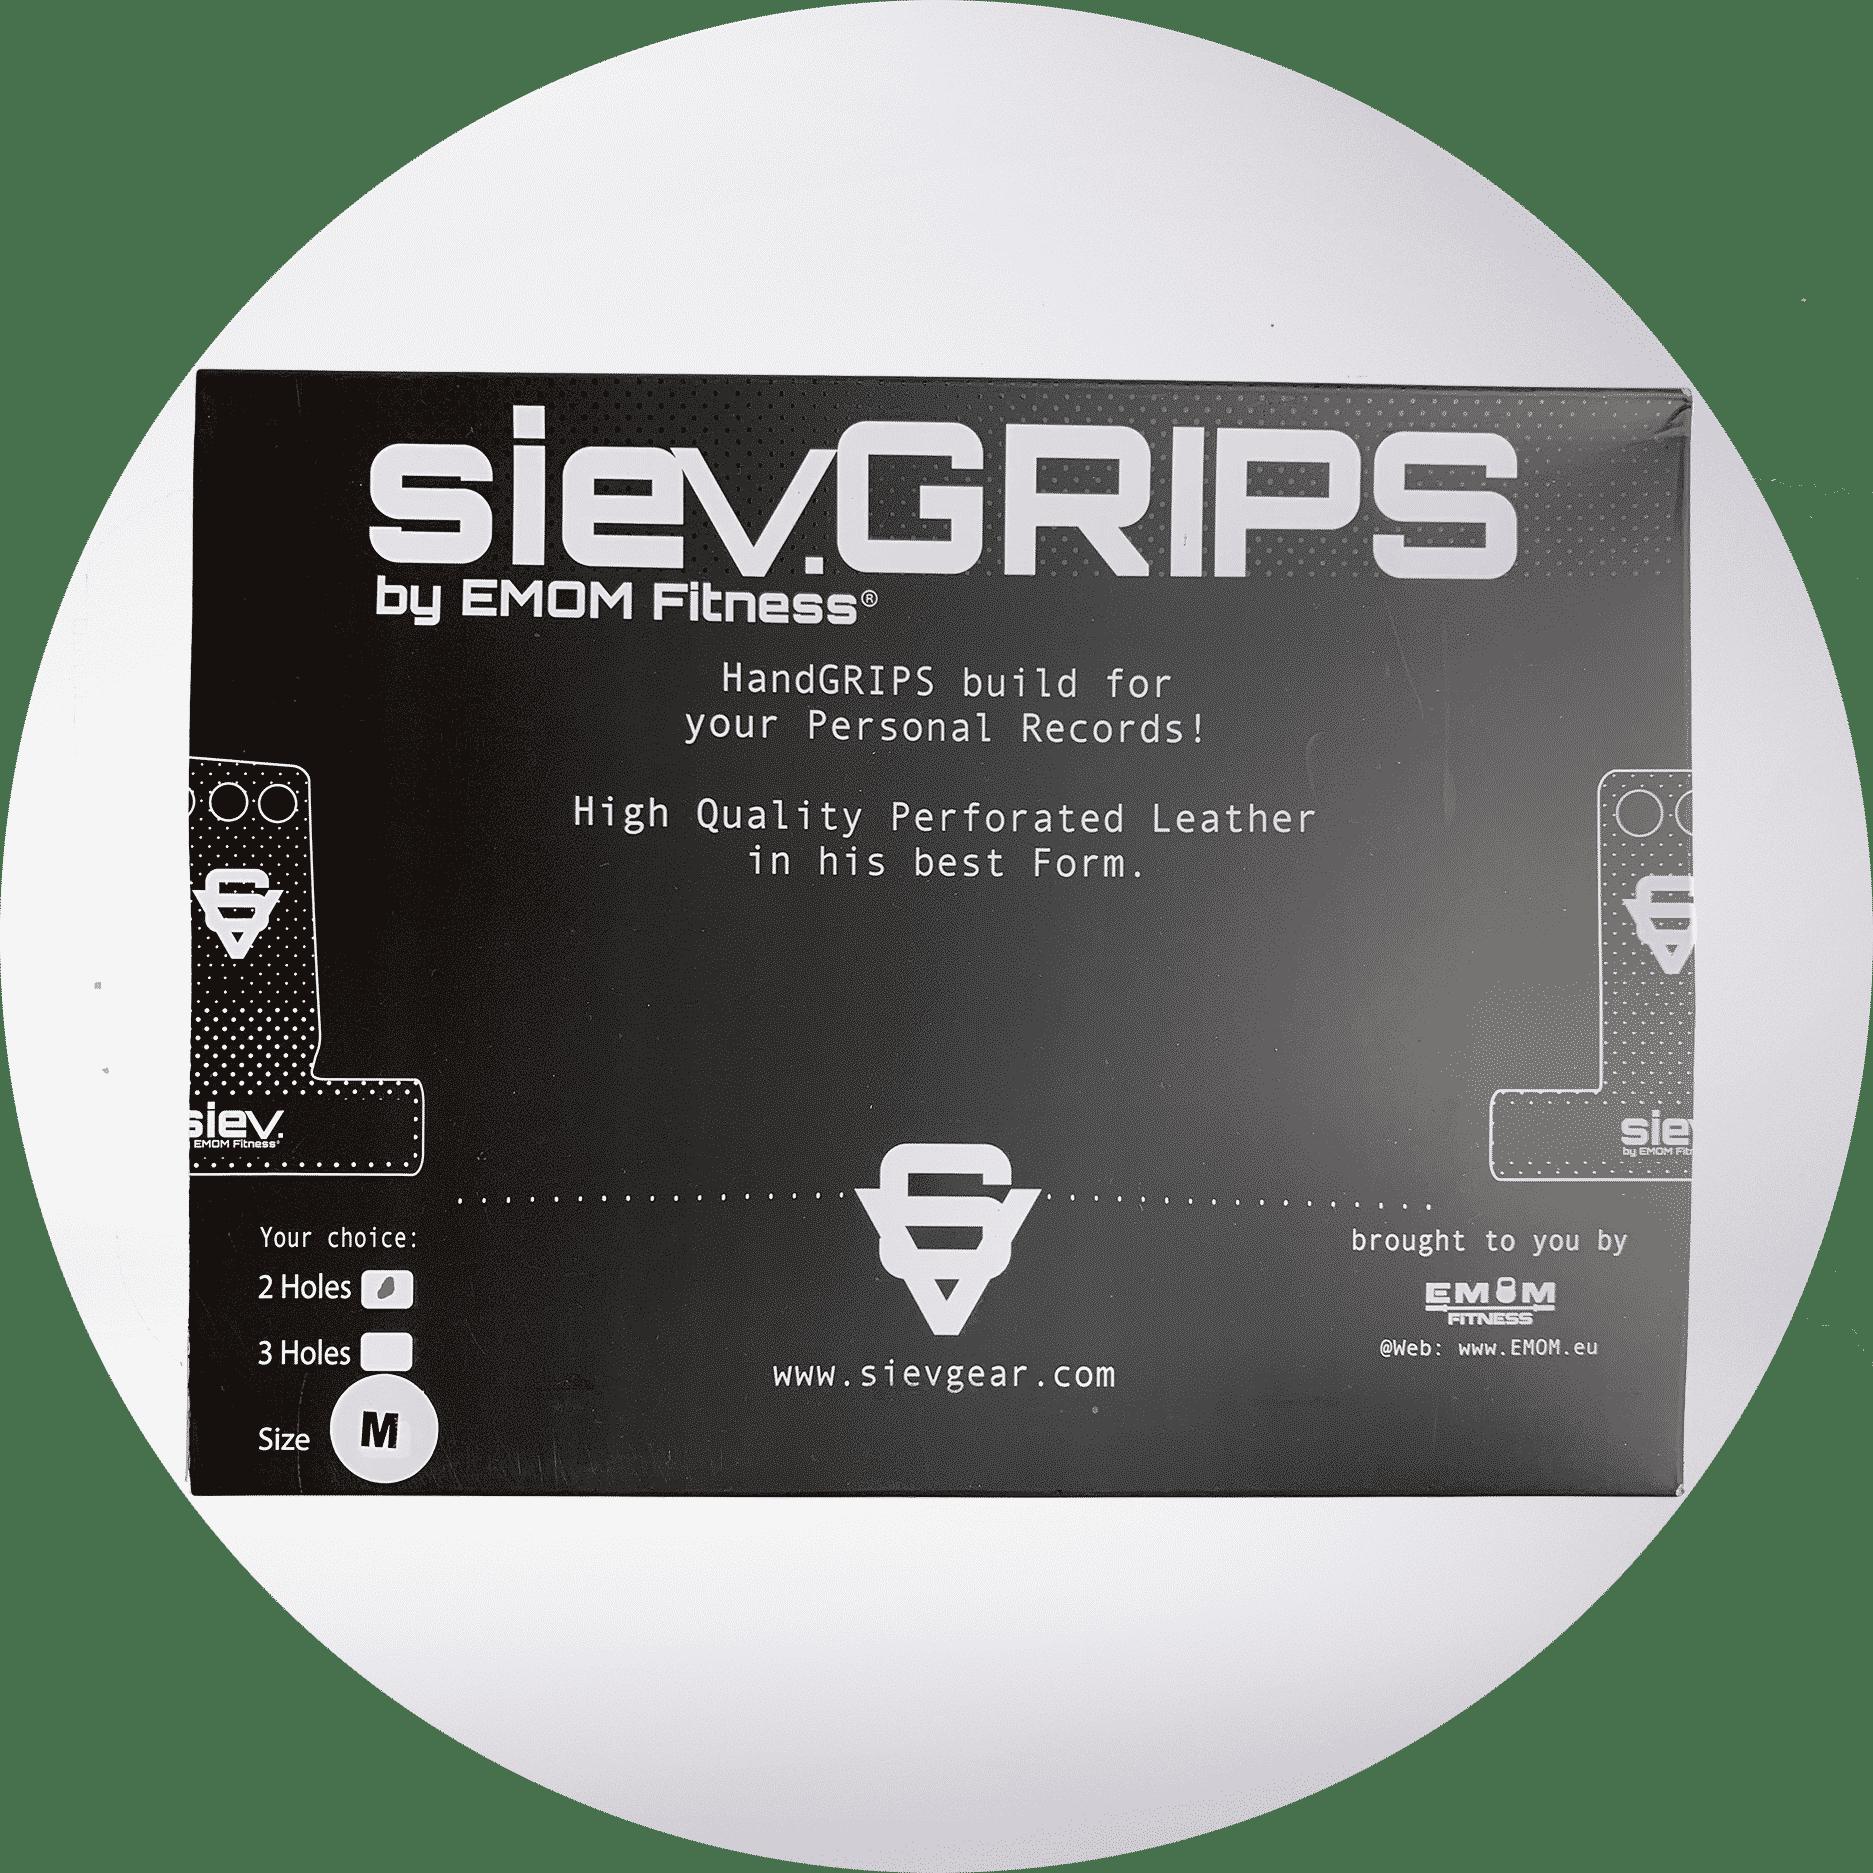 siev.Grips- Grips 2H - Premium Hand Grips 11